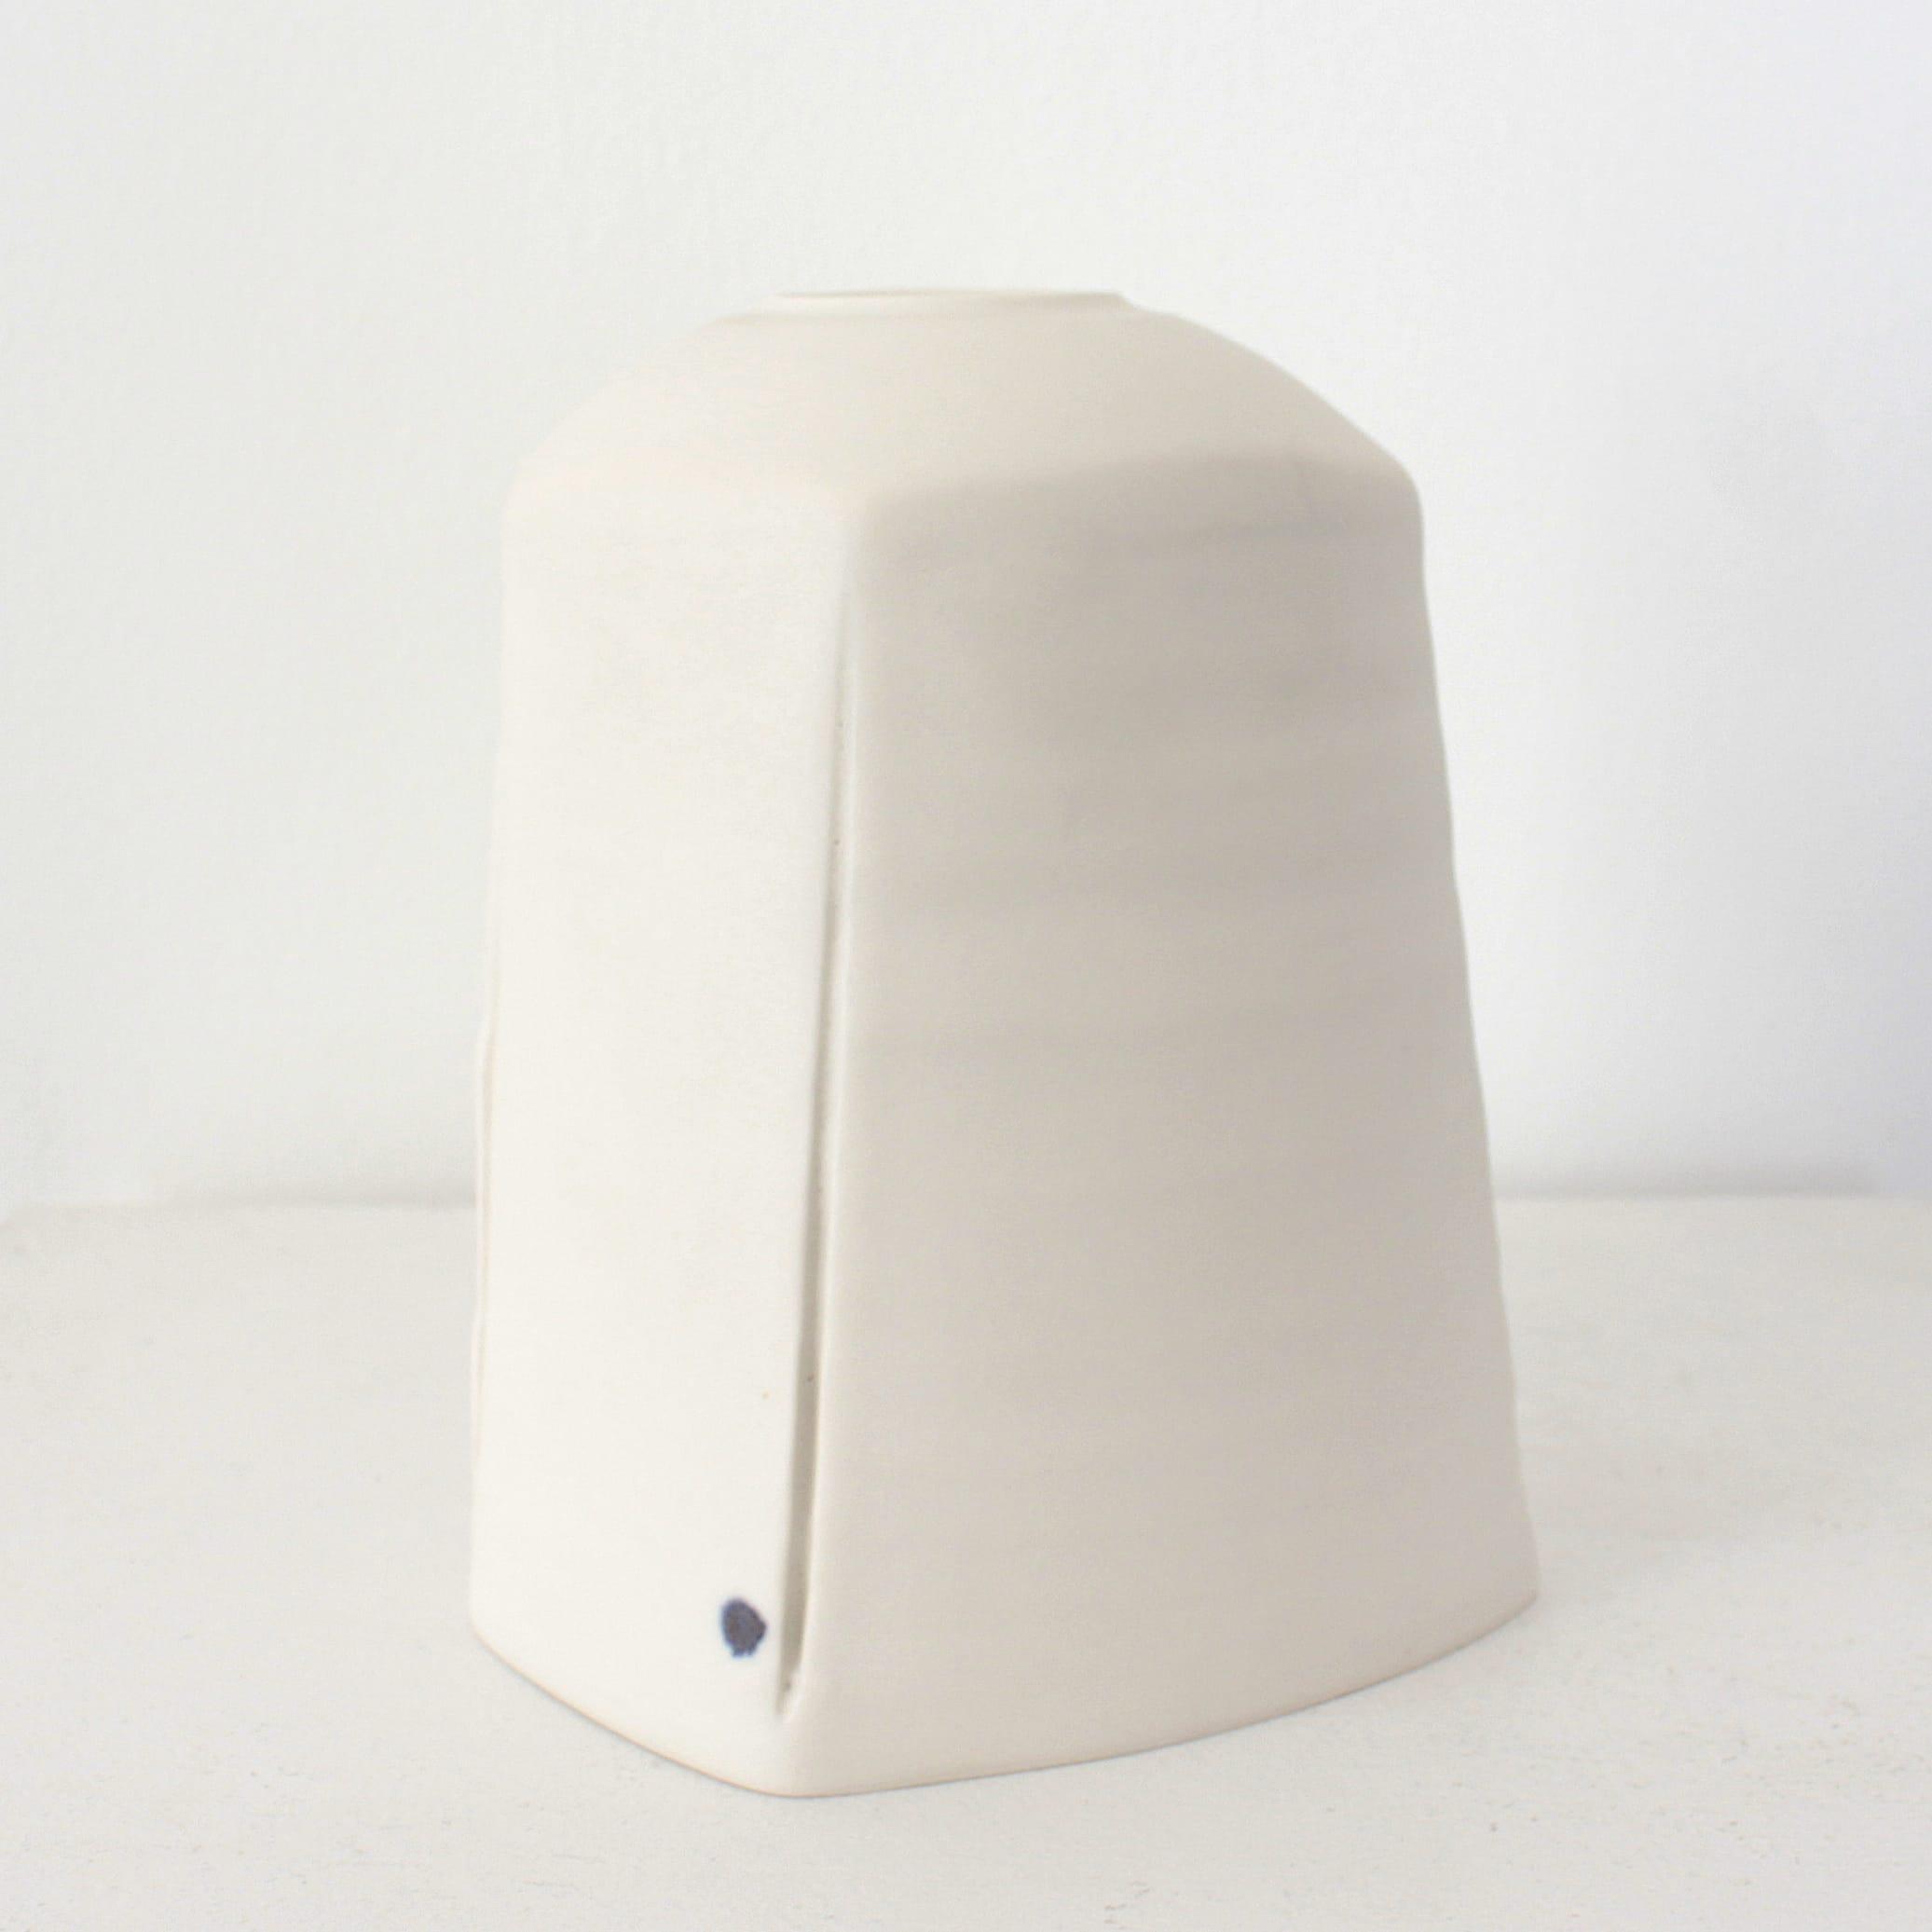 "<span class=""link fancybox-details-link""><a href=""/artists/99-carina-ciscato/works/7877-carina-ciscato-white-enclosed-constructed-porcelain-pot-2021/"">View Detail Page</a></span><div class=""artist""><strong>Carina Ciscato</strong></div> <div class=""title""><em>White Enclosed Constructed Porcelain Pot</em>, 2021</div> <div class=""signed_and_dated"">artist stamp</div> <div class=""medium"">porcelain</div> <div class=""dimensions"">15 x 11 x 12 cm</div><div class=""price"">£715.00</div><div class=""copyright_line"">Own Art: £71.50 x 10 Months, 0% APR</div>"